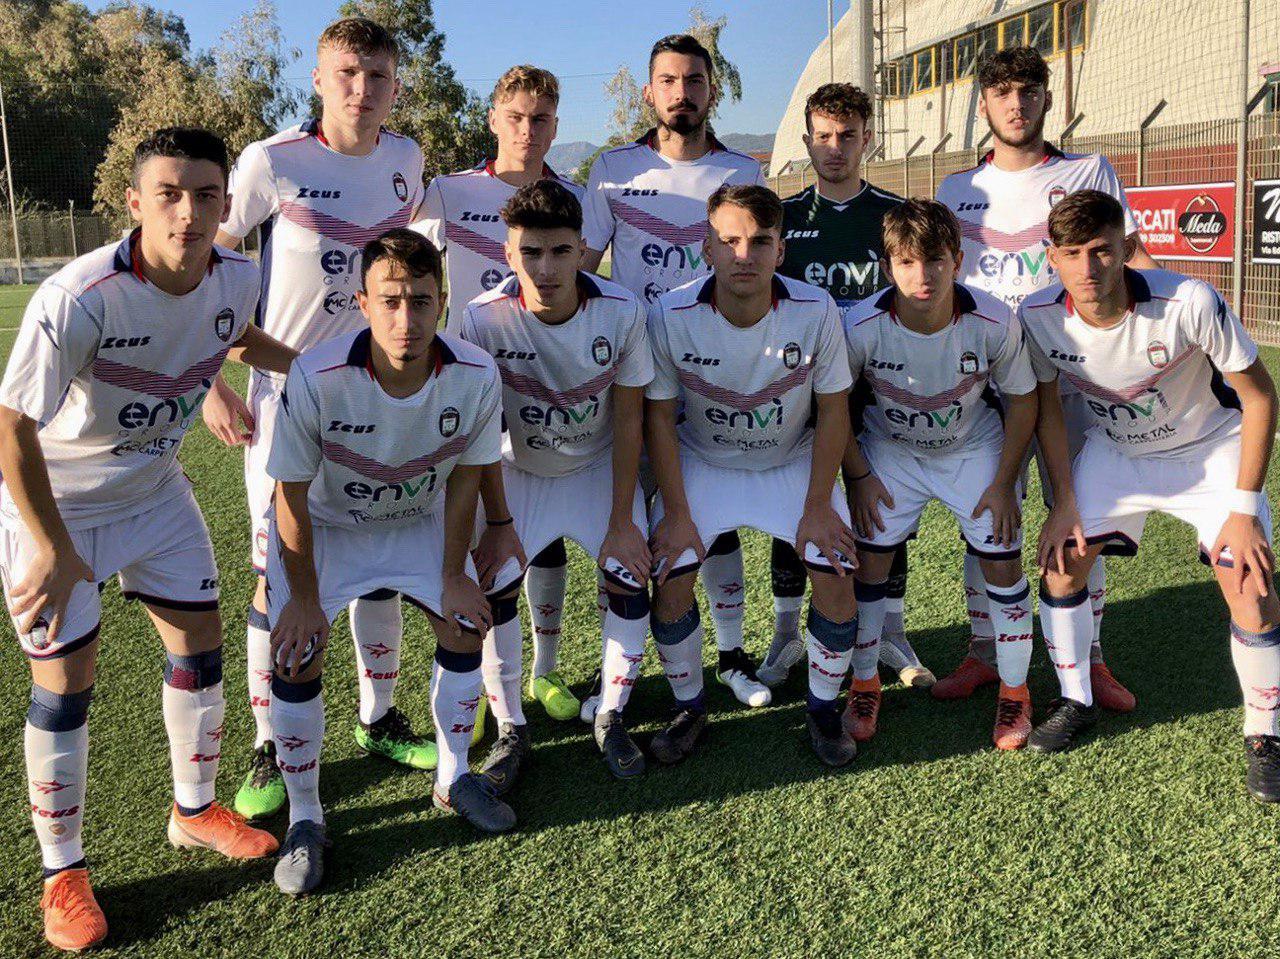 Primavera 2, 12a giornata: Salernitana-Crotone 0-0